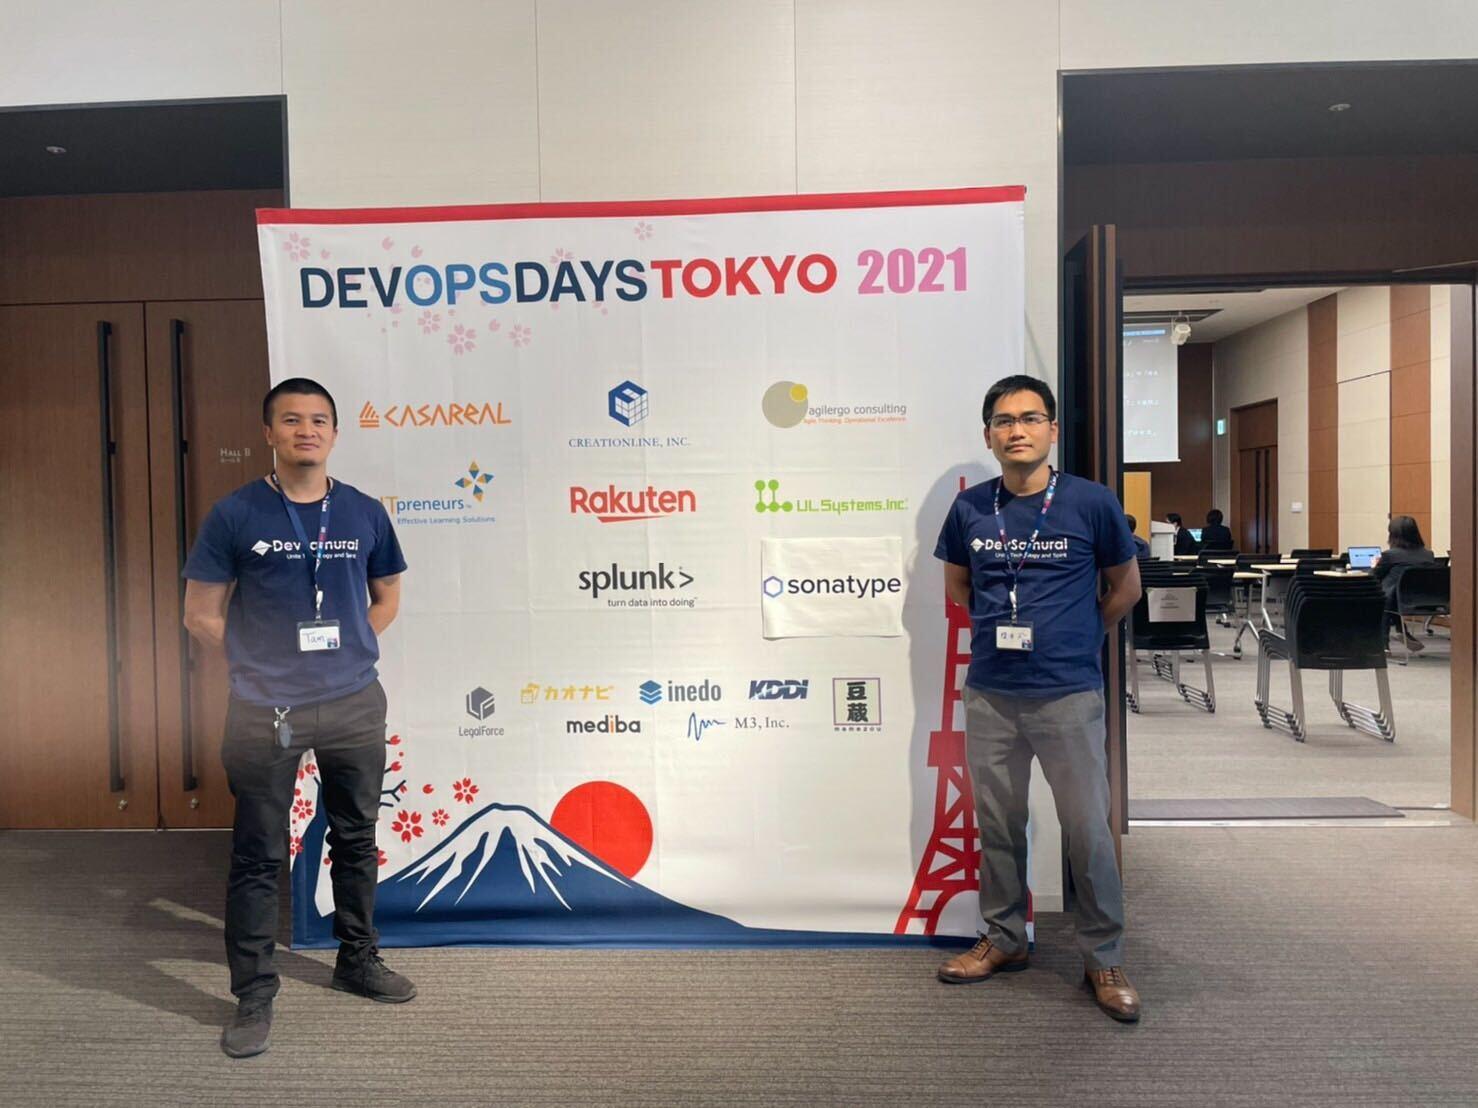 DevOps Day Tokyo 2021は開催され、DevSamuraiは出展